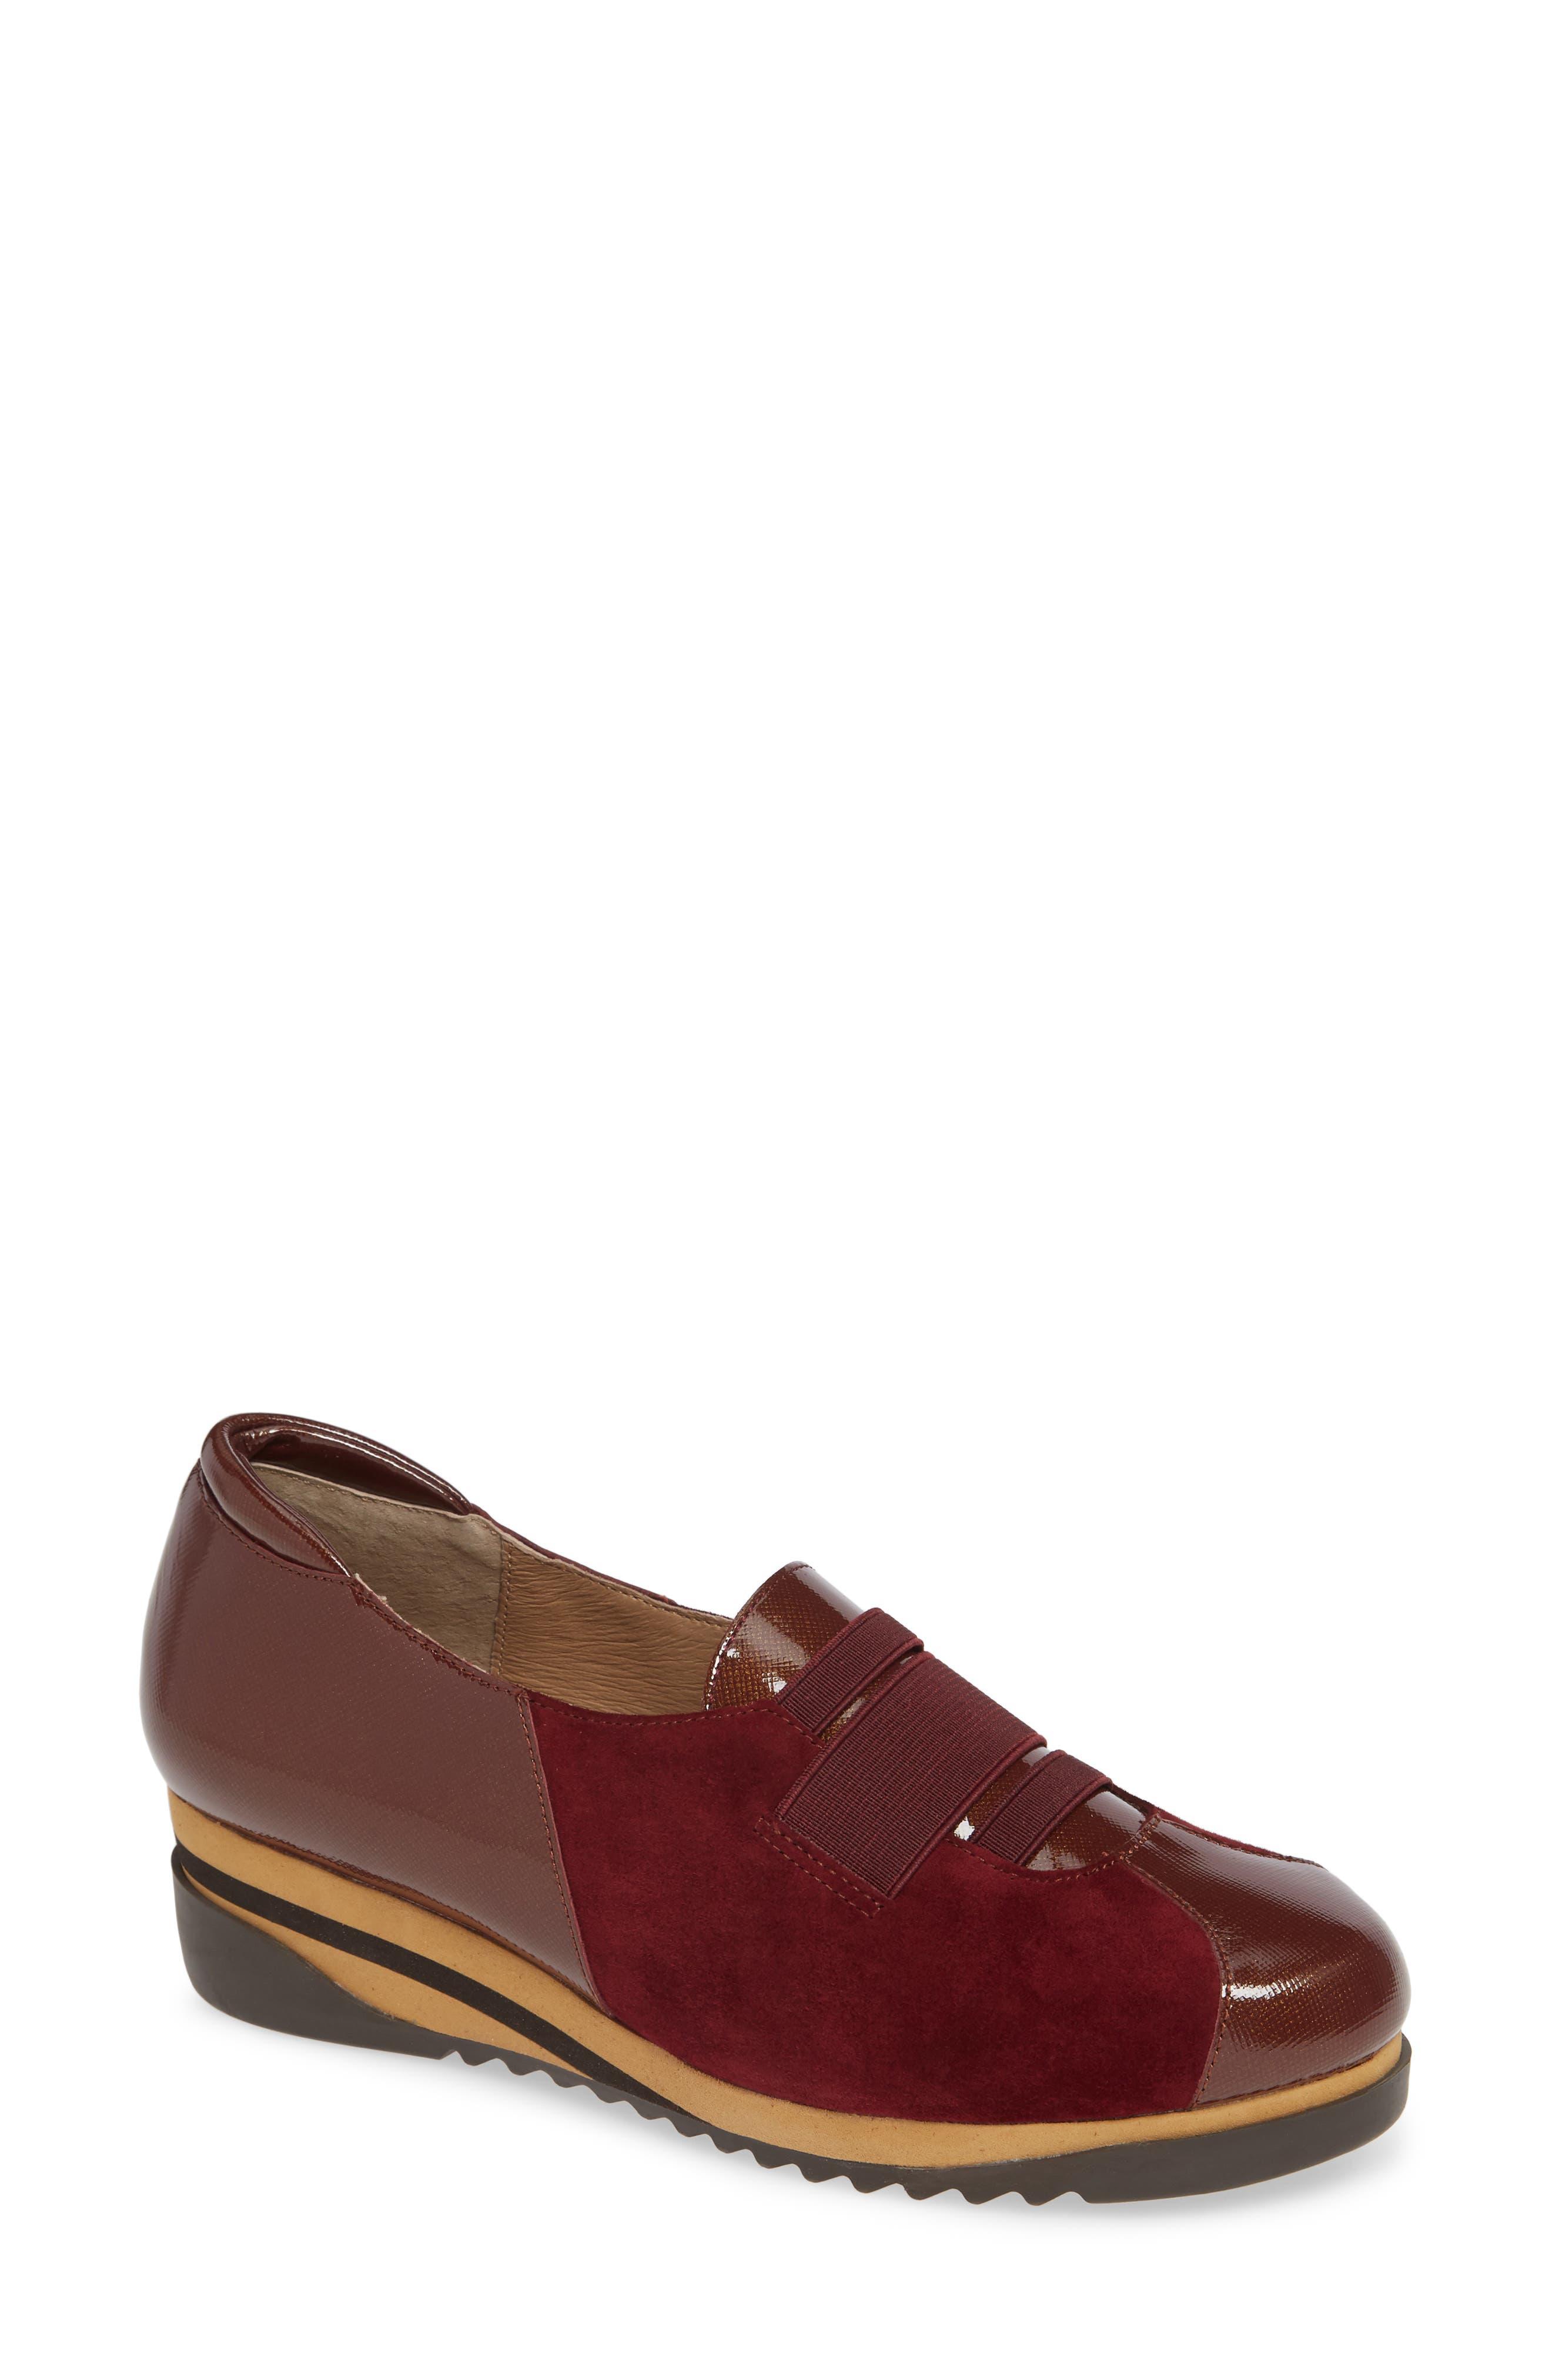 Bettye Muller Concepts Taytum Sneaker, Red